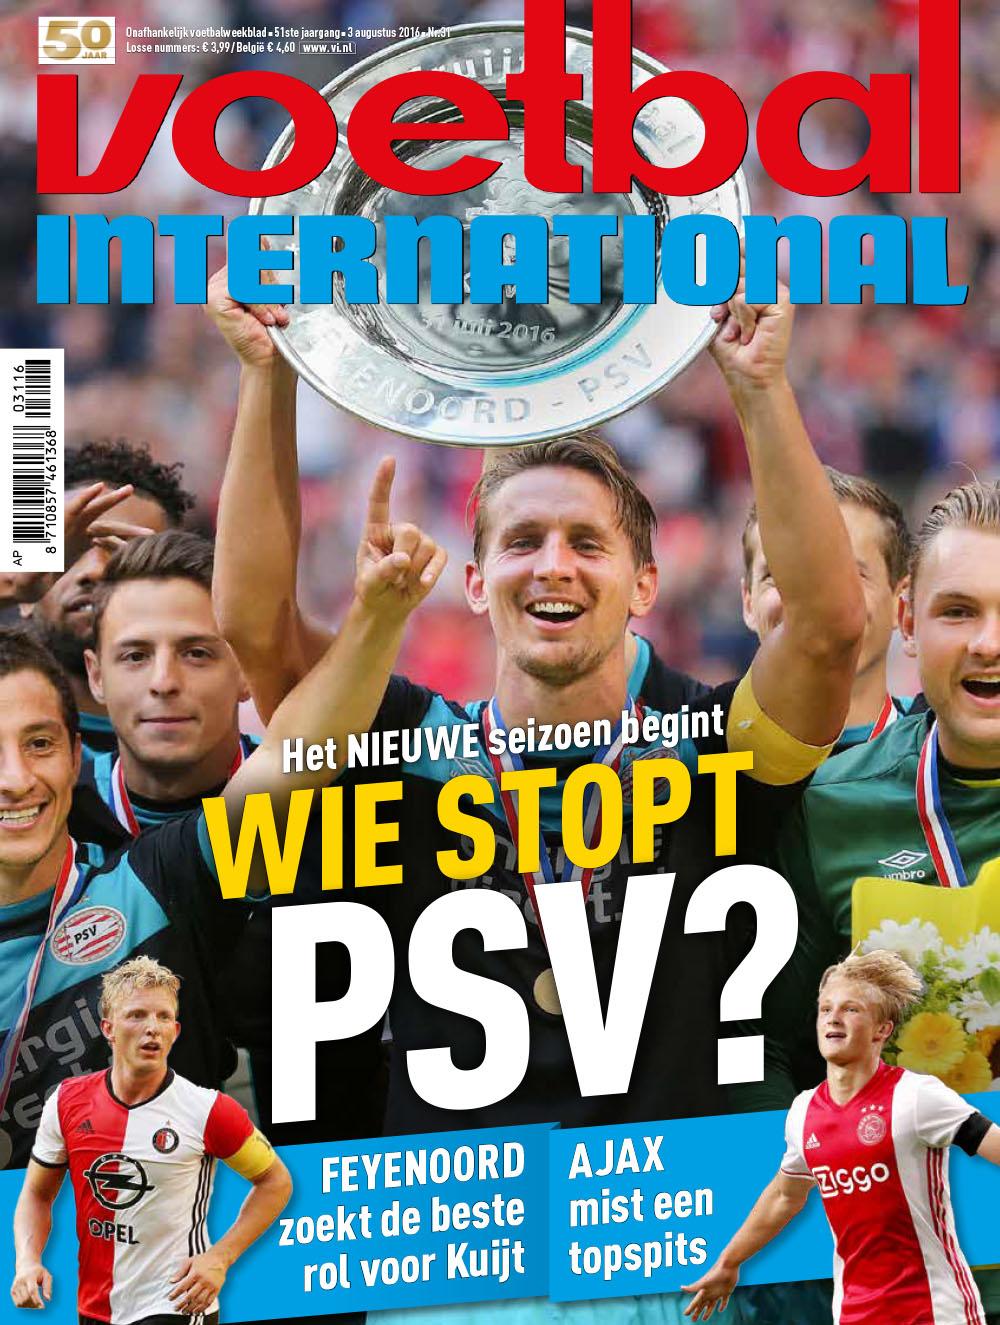 Cover VI 31-2016 - Landelijk